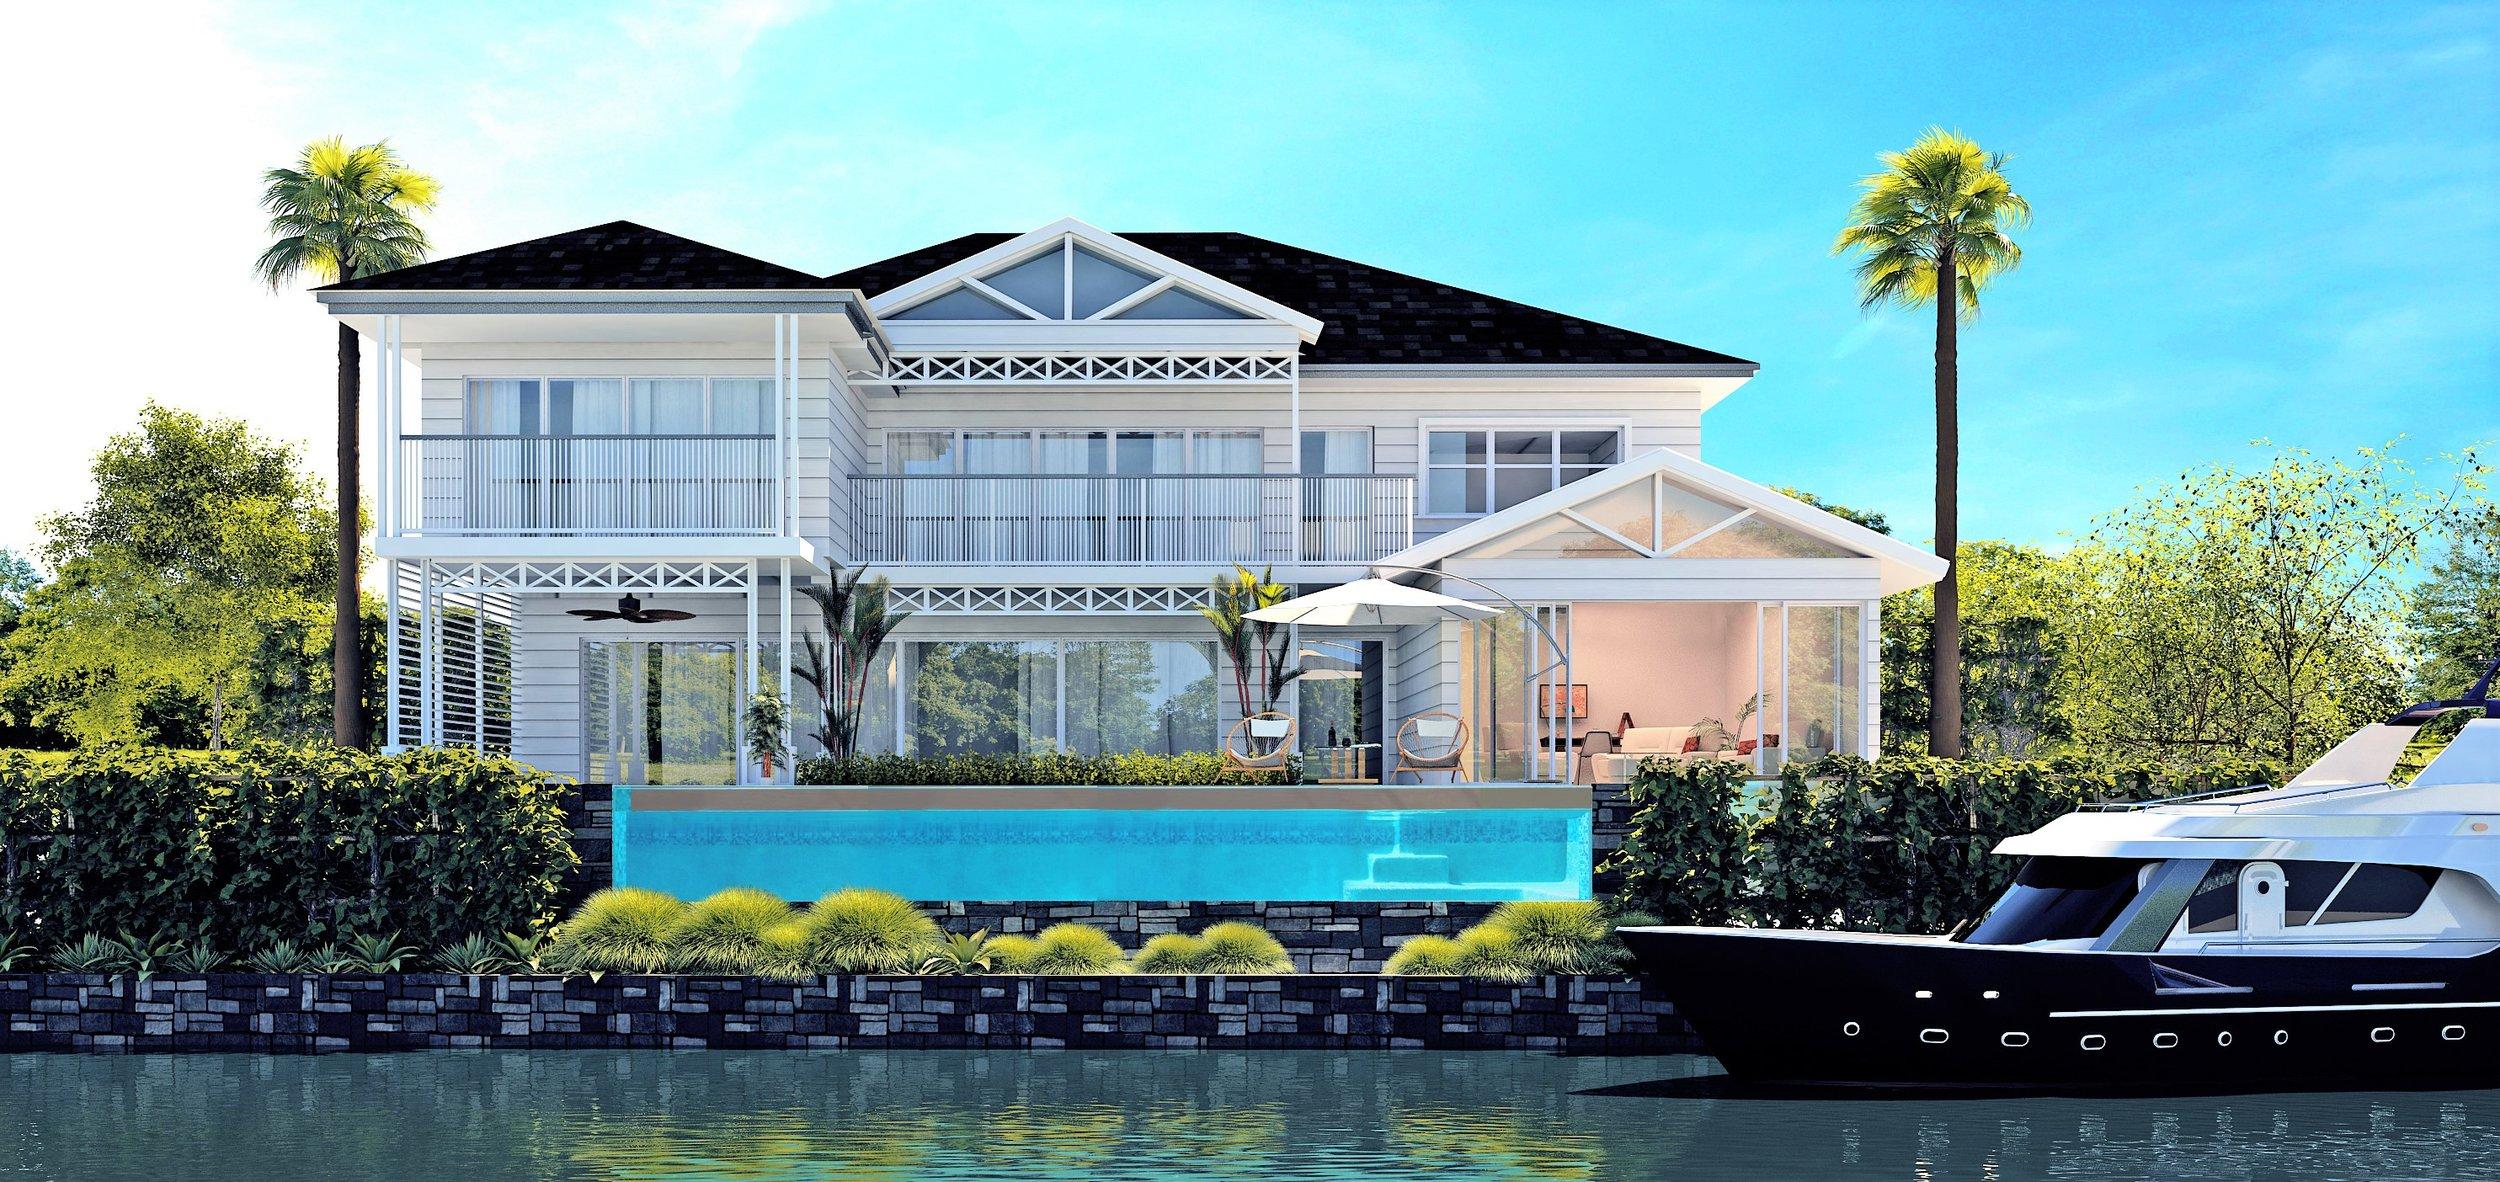 BRIBIE ISLAND HOUSE